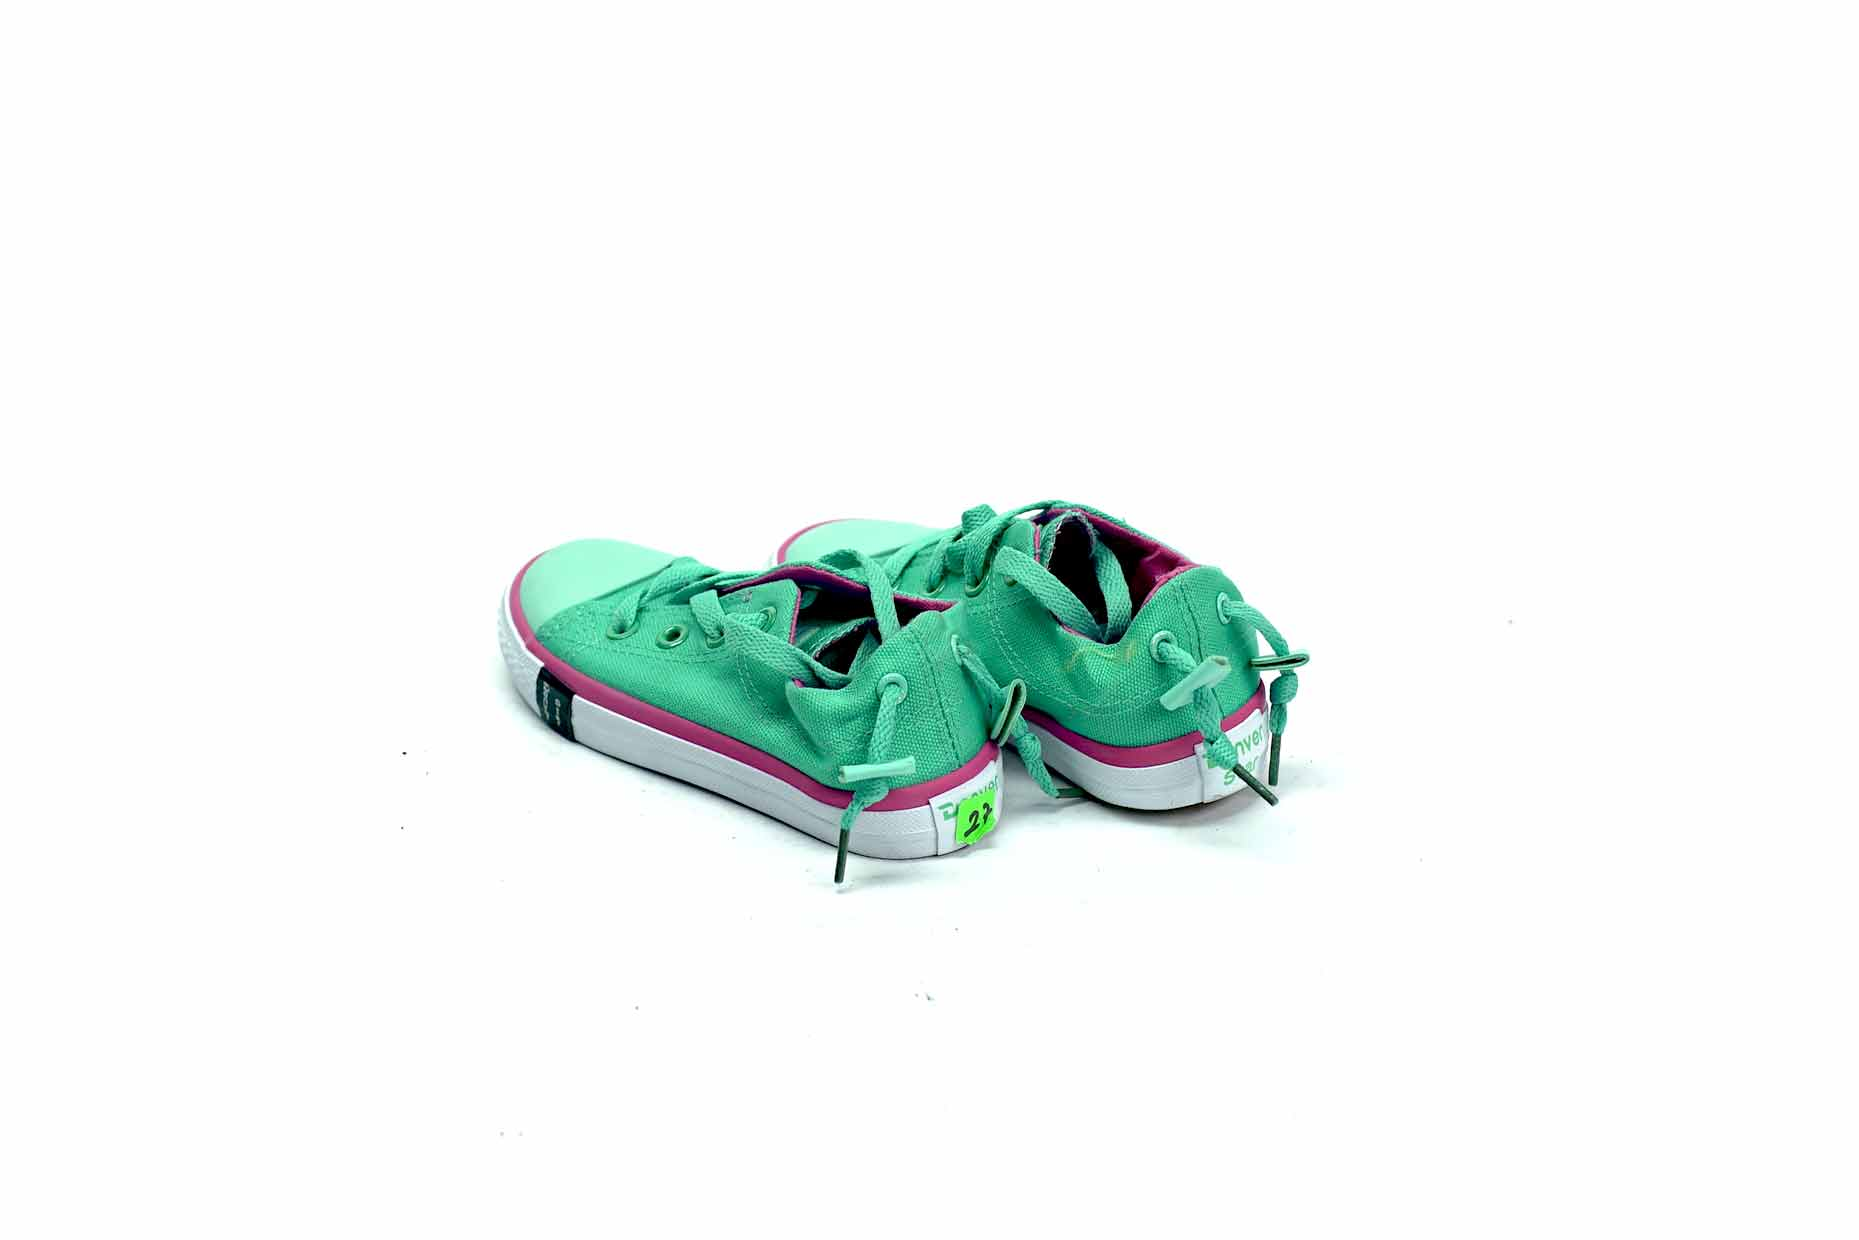 zapatos zapatos zapatos detalle verdes detalle verdes verdes detalle q1XXtTxw5